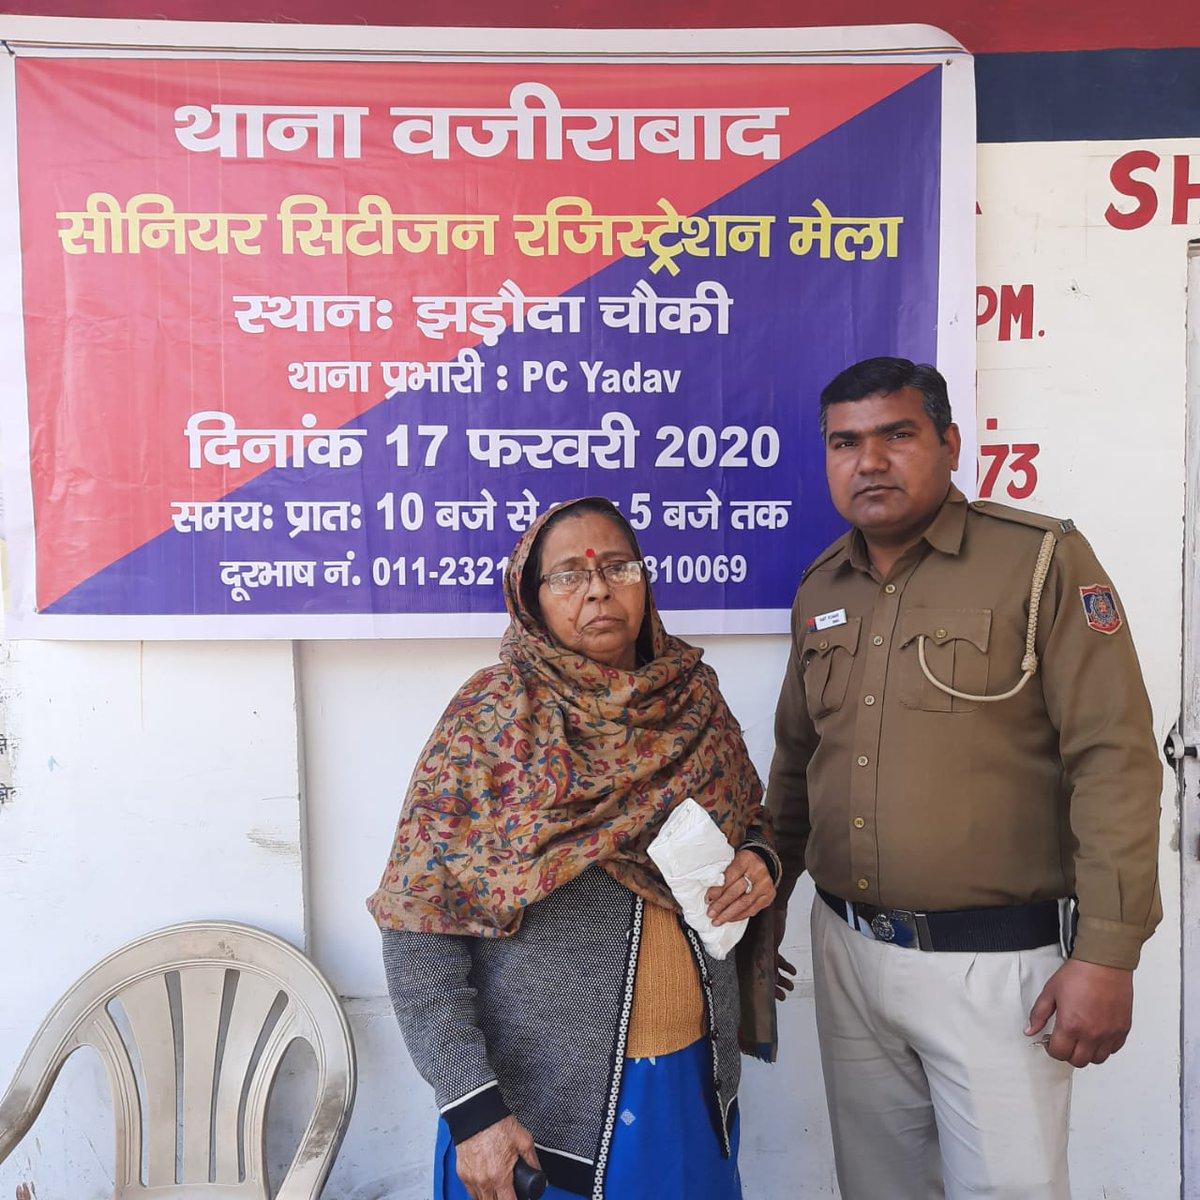 #SeniorCitizen Registeration camp organized during #DelhiPoliceWeek. Your smile is our Reward.@DelhiPolice